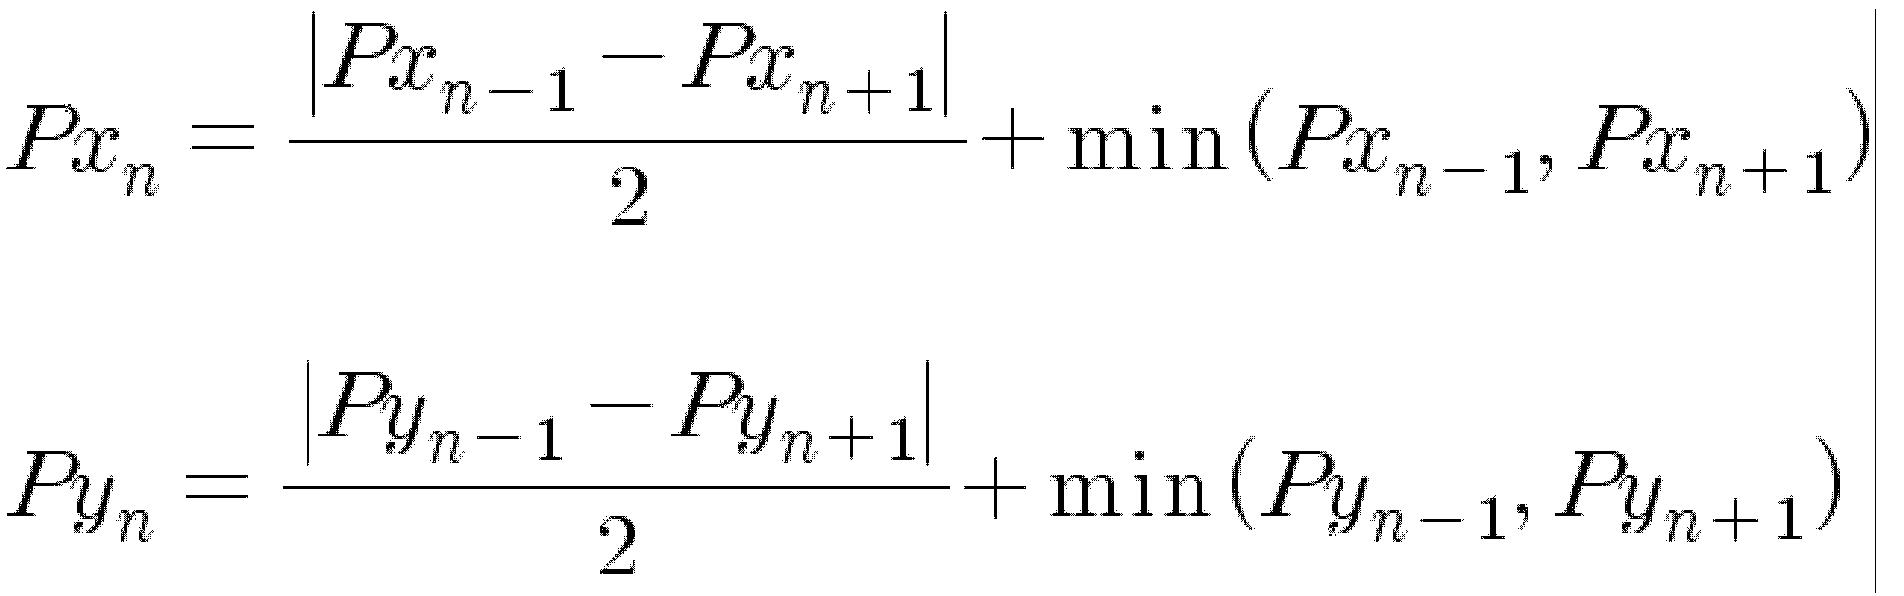 Figure 112012008501843-pat00001